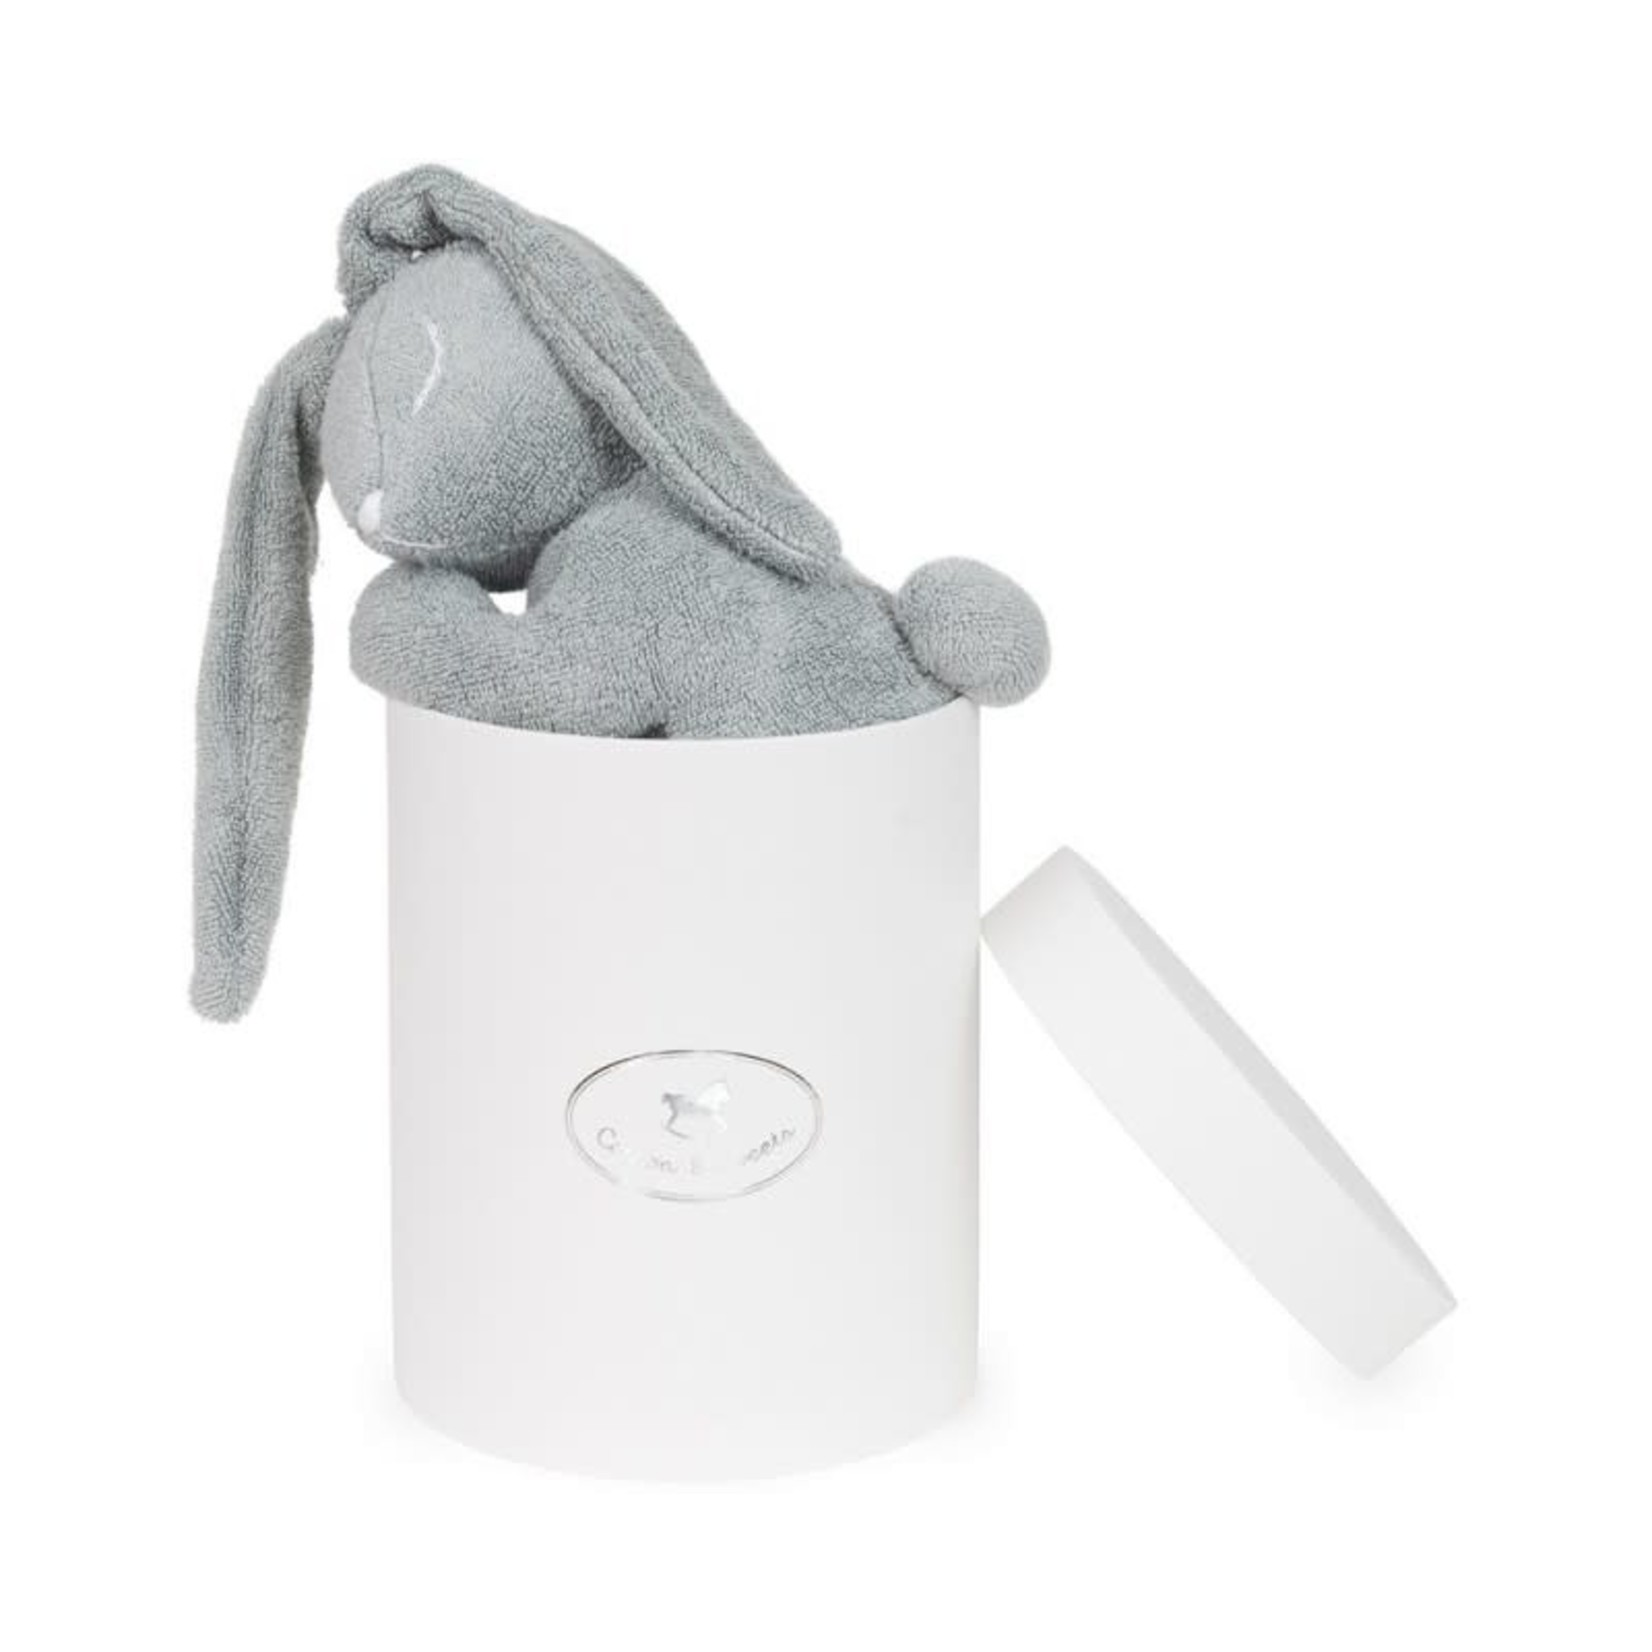 Cotton & Sweets Rabbit Light Gray